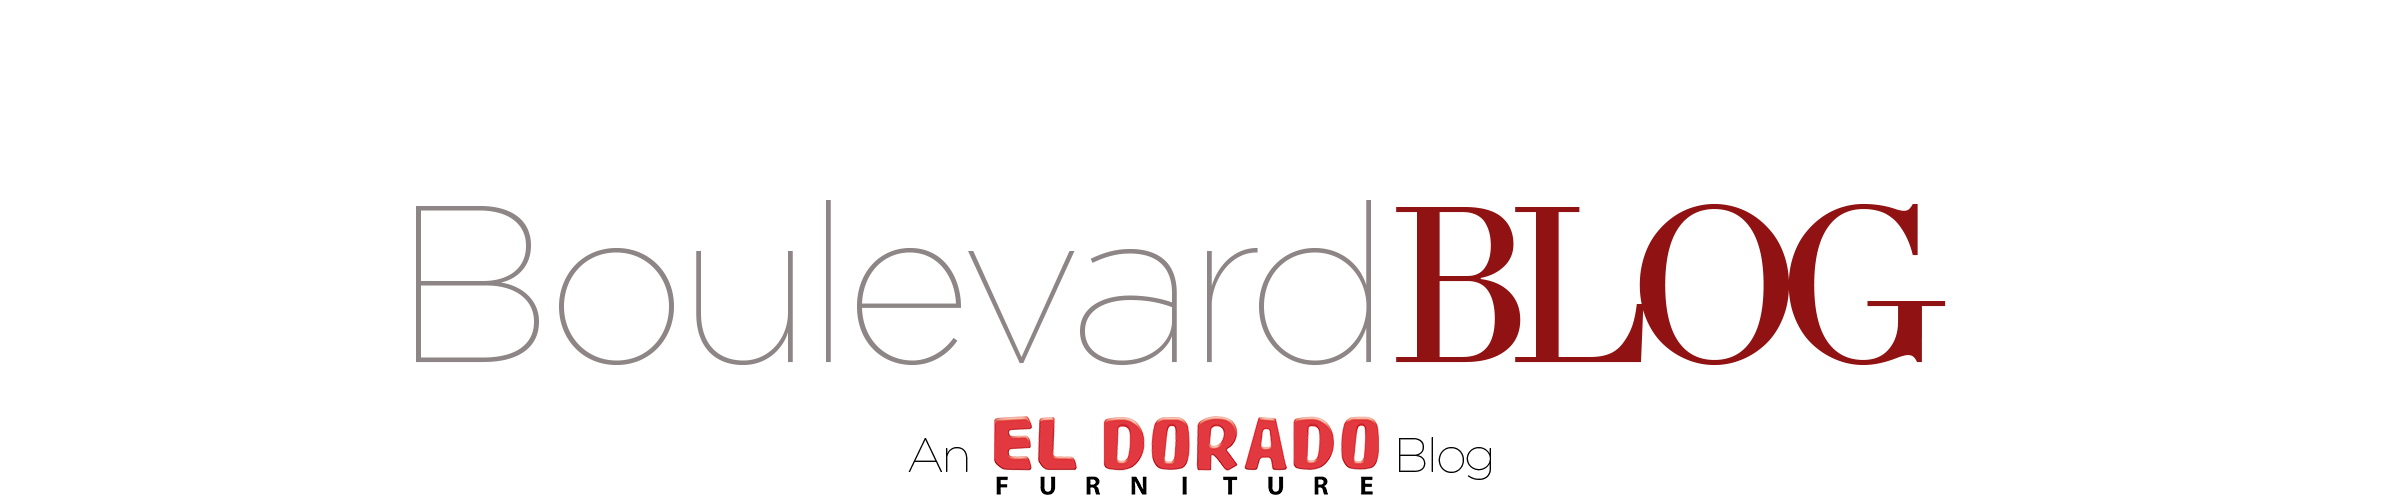 BoulevardBlog